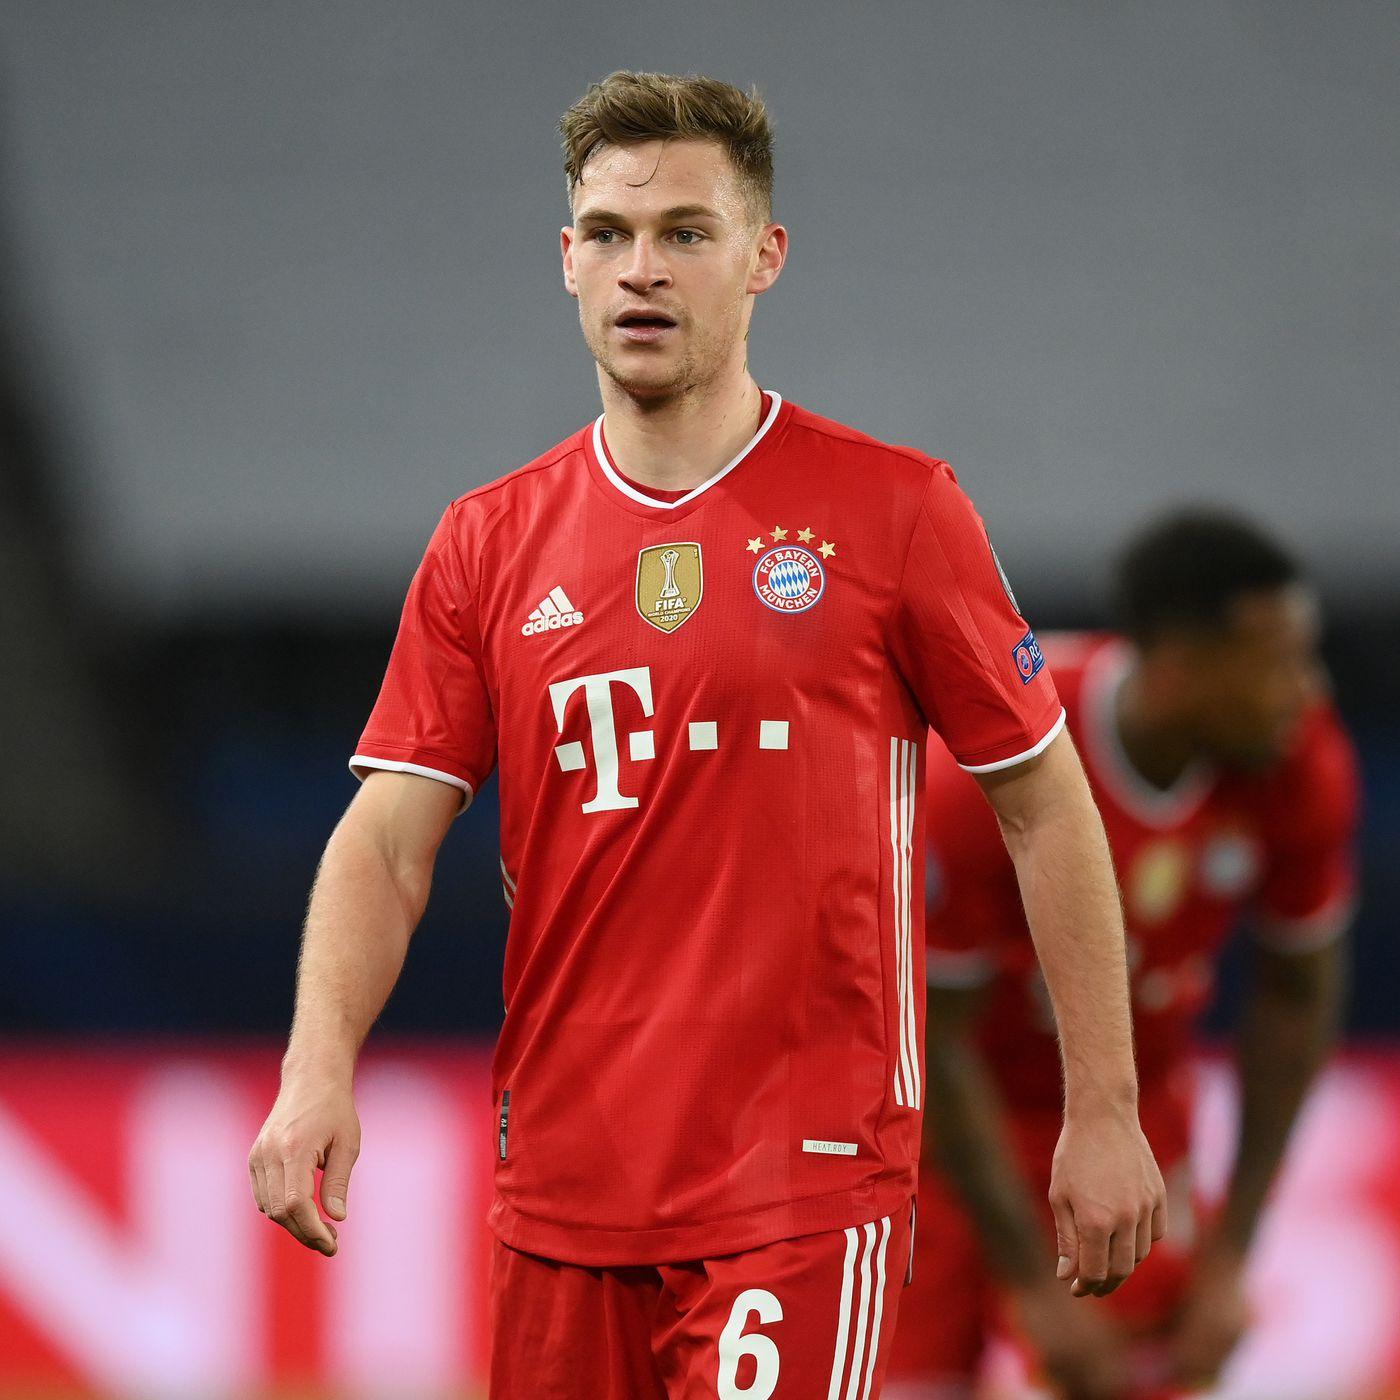 Bayern Munich S Joshua Kimmich Ditches Agent Aiming For Big Salary Like Muller Lewandowski And Neuer Update Bavarian Football Works